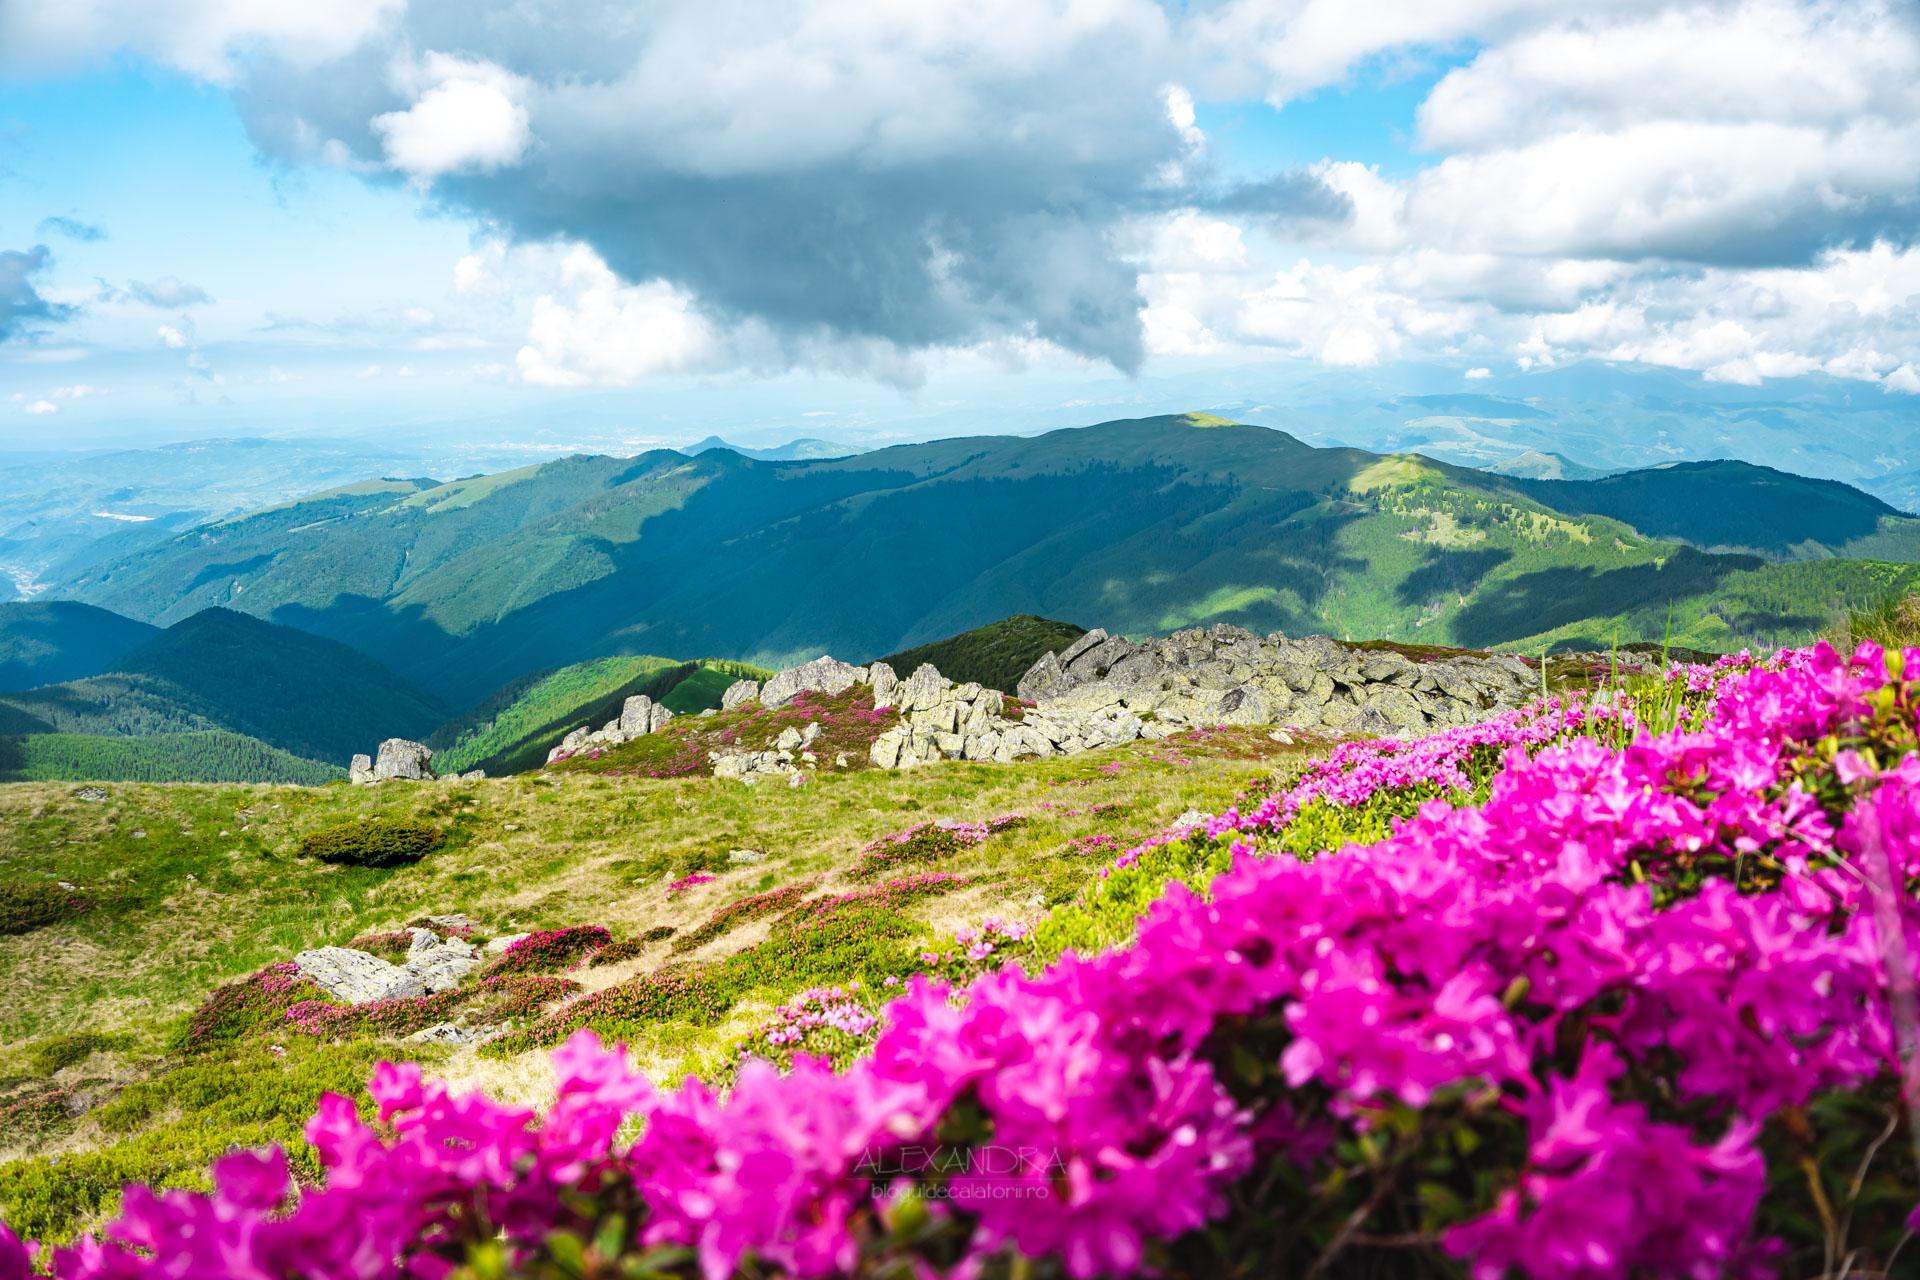 Vârful Leaota bujor de munte